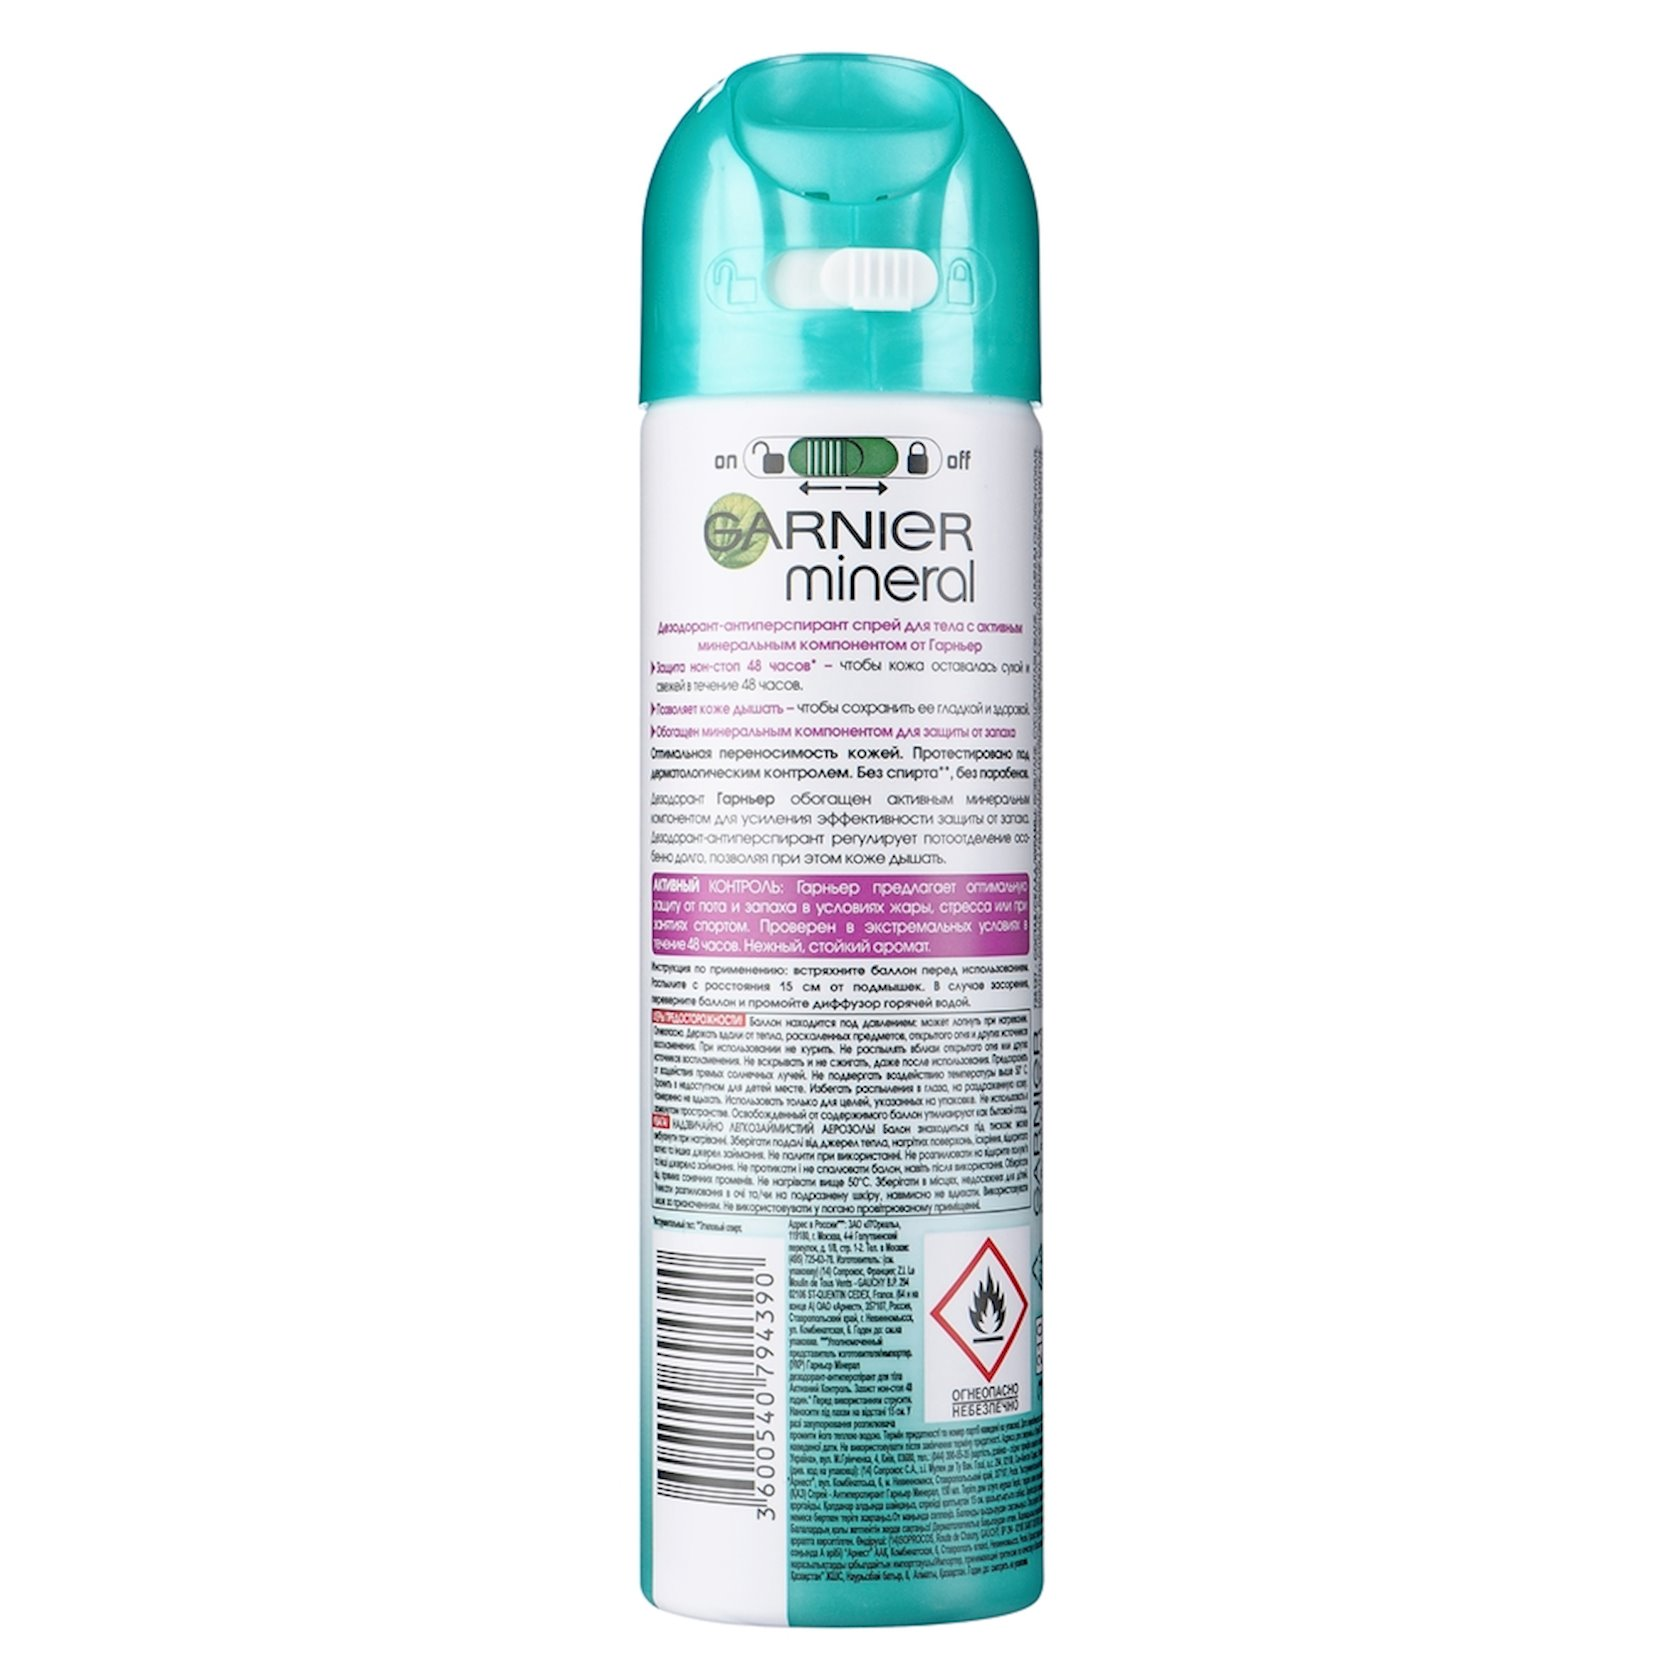 Antiperspirant Garnier Mineral aktiv Kontrol 150 ml